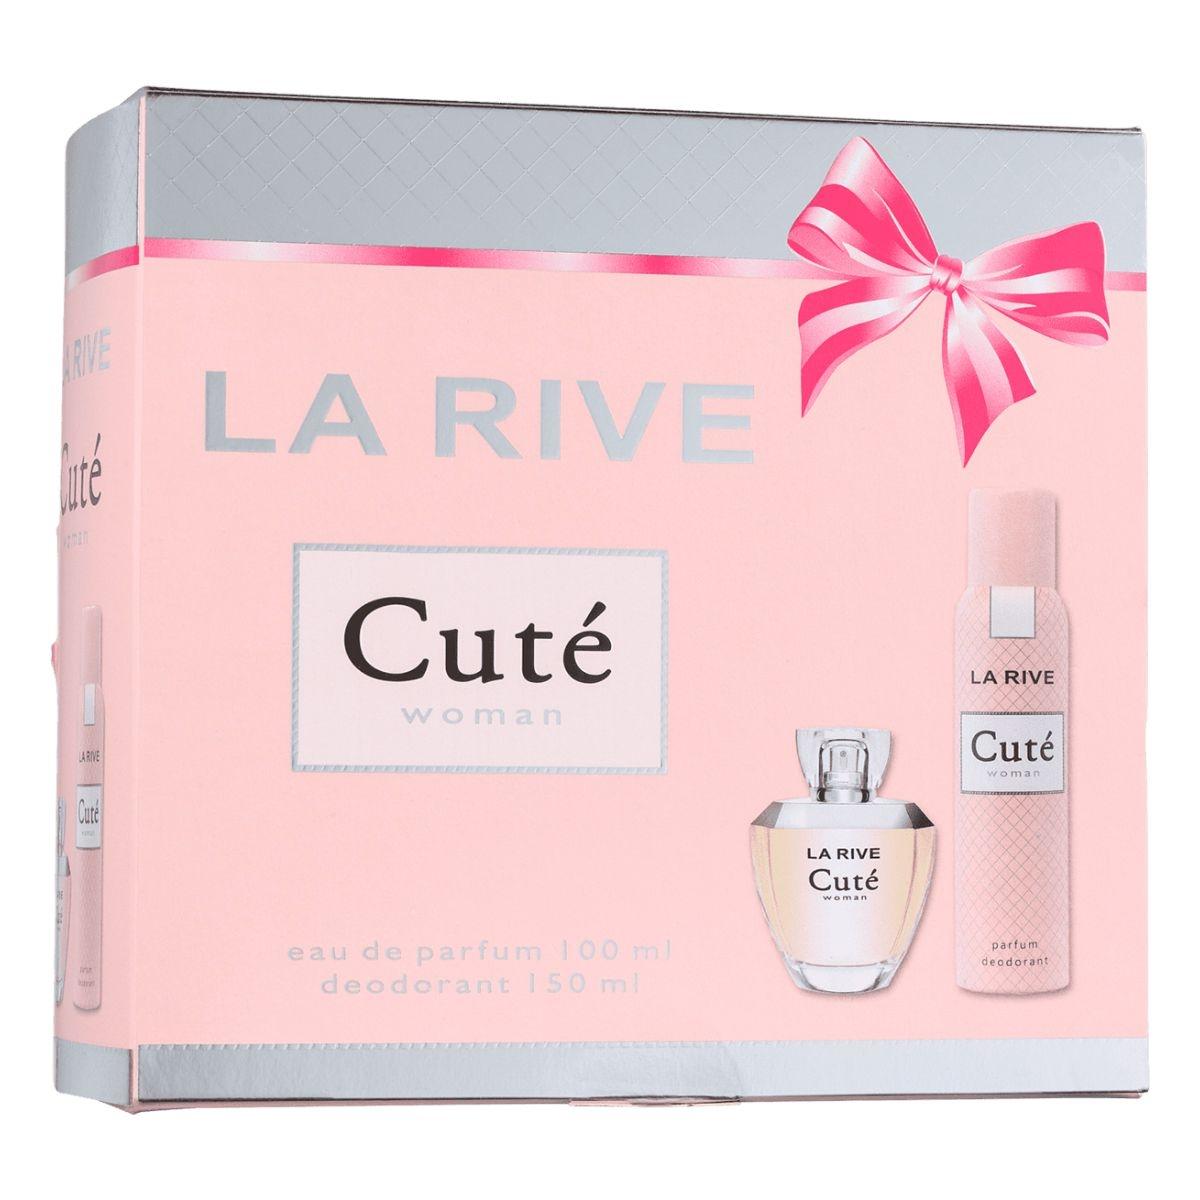 Kit Perfume Cuté F 100ml + Desodorante 150ml La Rive  - Mercari Perfumes